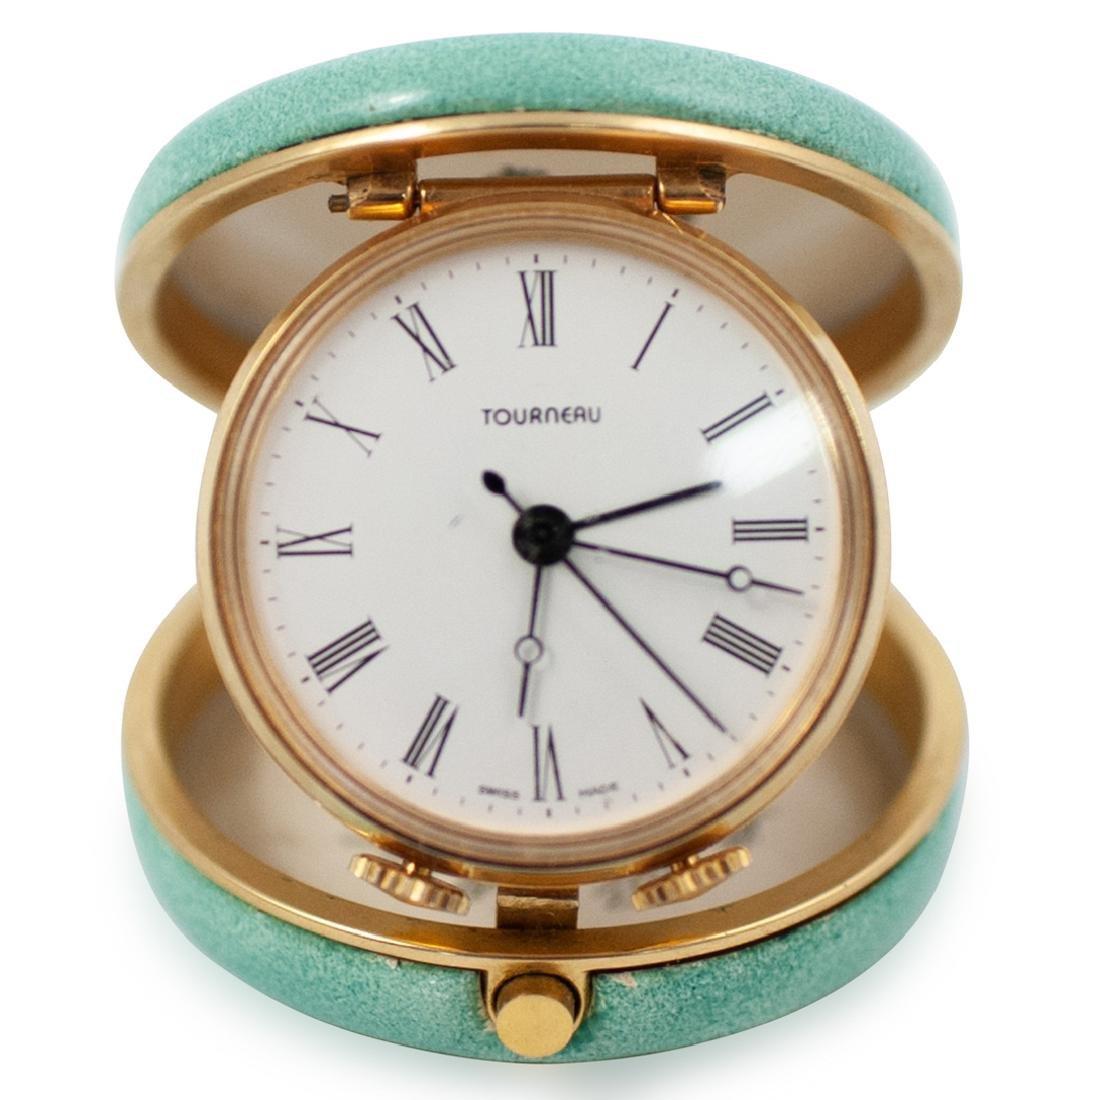 Halcyon Days Enamel Compact Watch